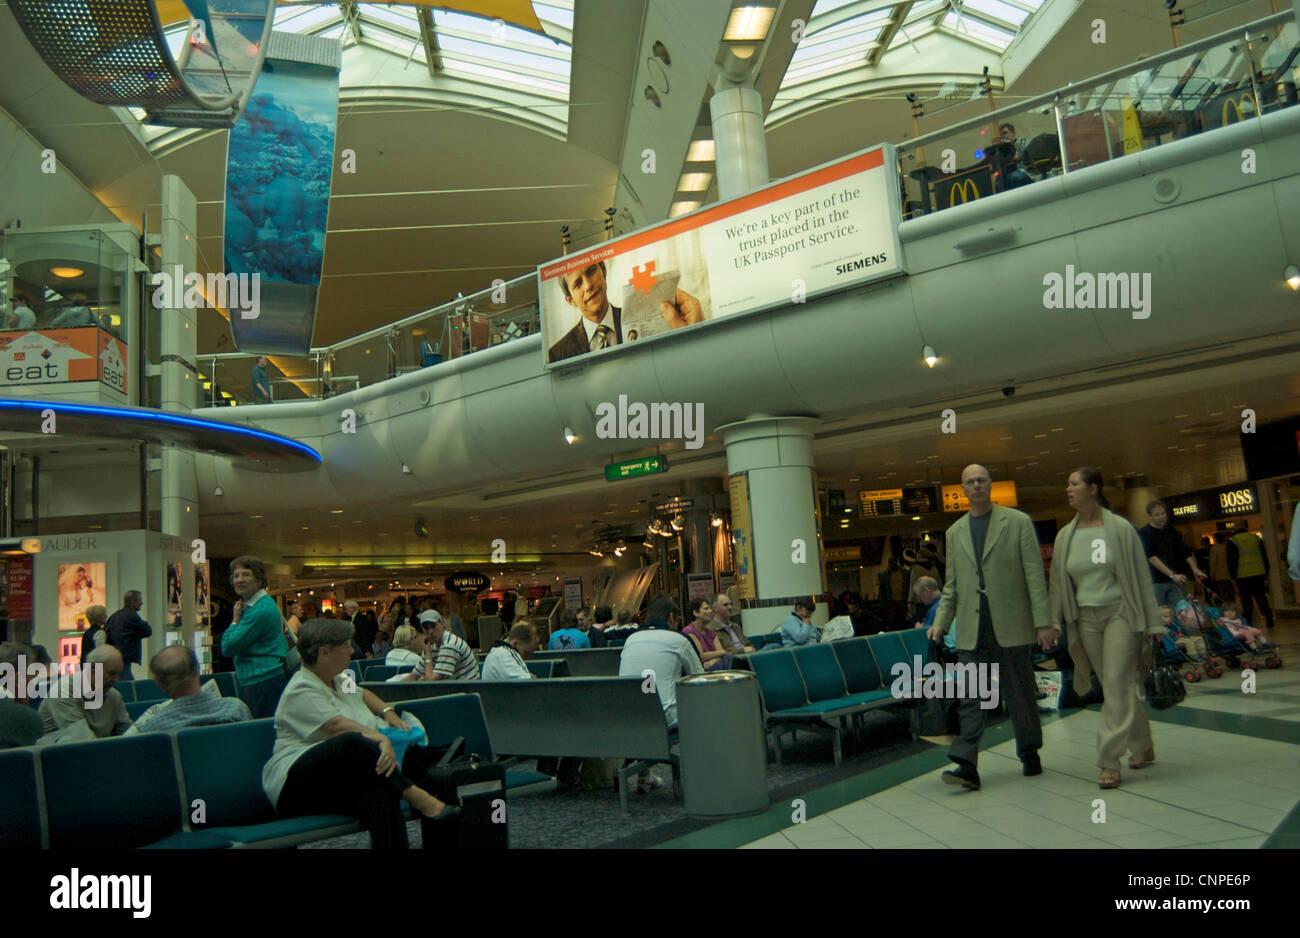 Gatwick airport departure lounge stock photos gatwick airport departure lounge stock images - Bureau de change crawley ...